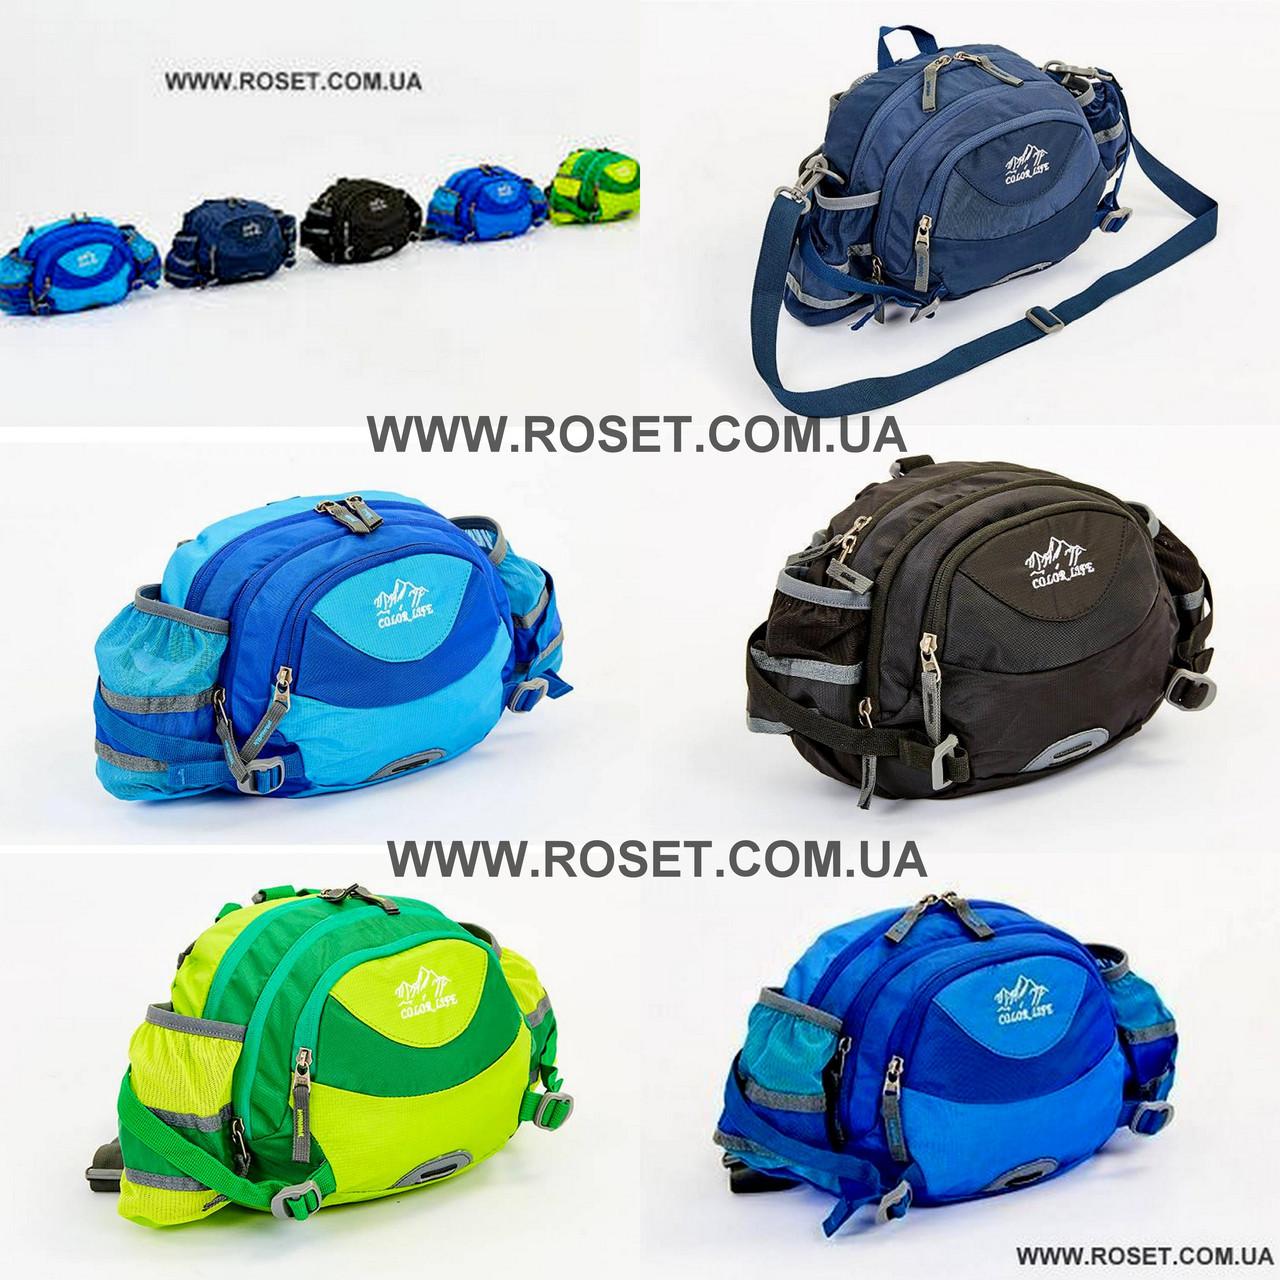 Спортивная сумка-рюкзак SBS Color Life 5335